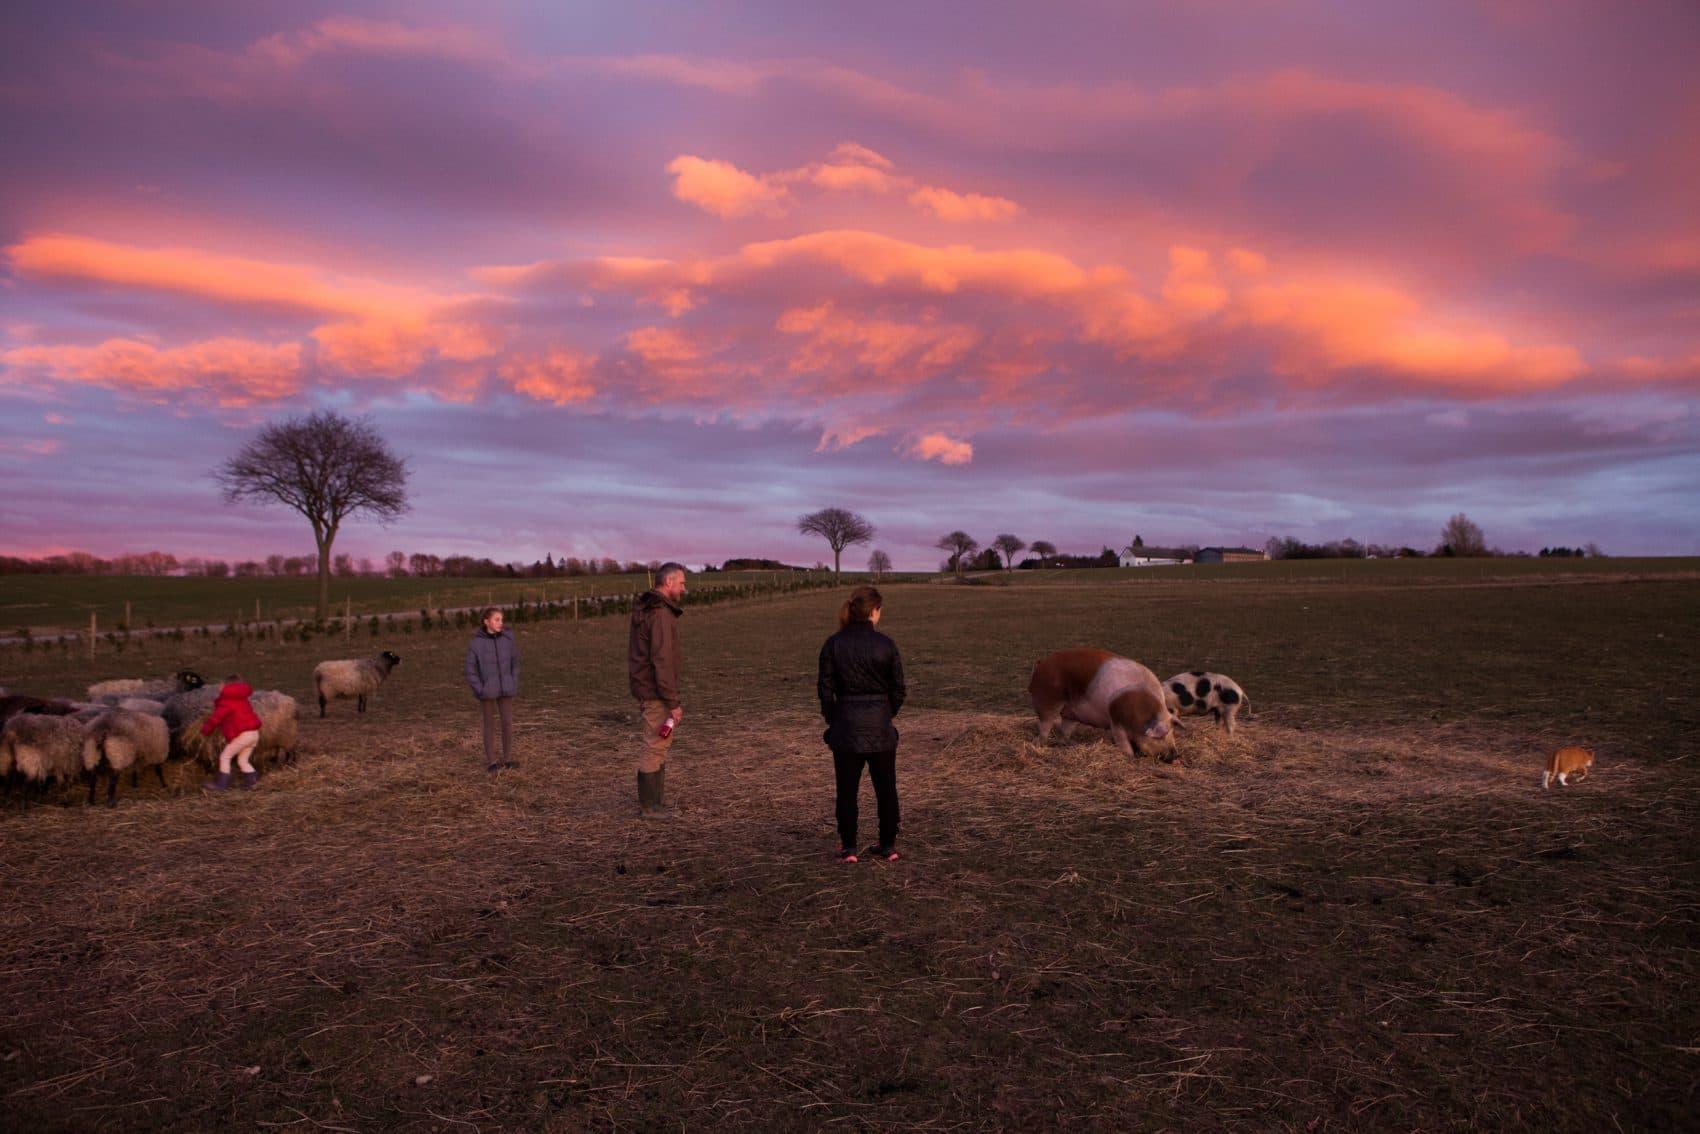 Sine Christiansen, center, with her family on their farm in Denmark (Photo by Rachael Cerrotti)